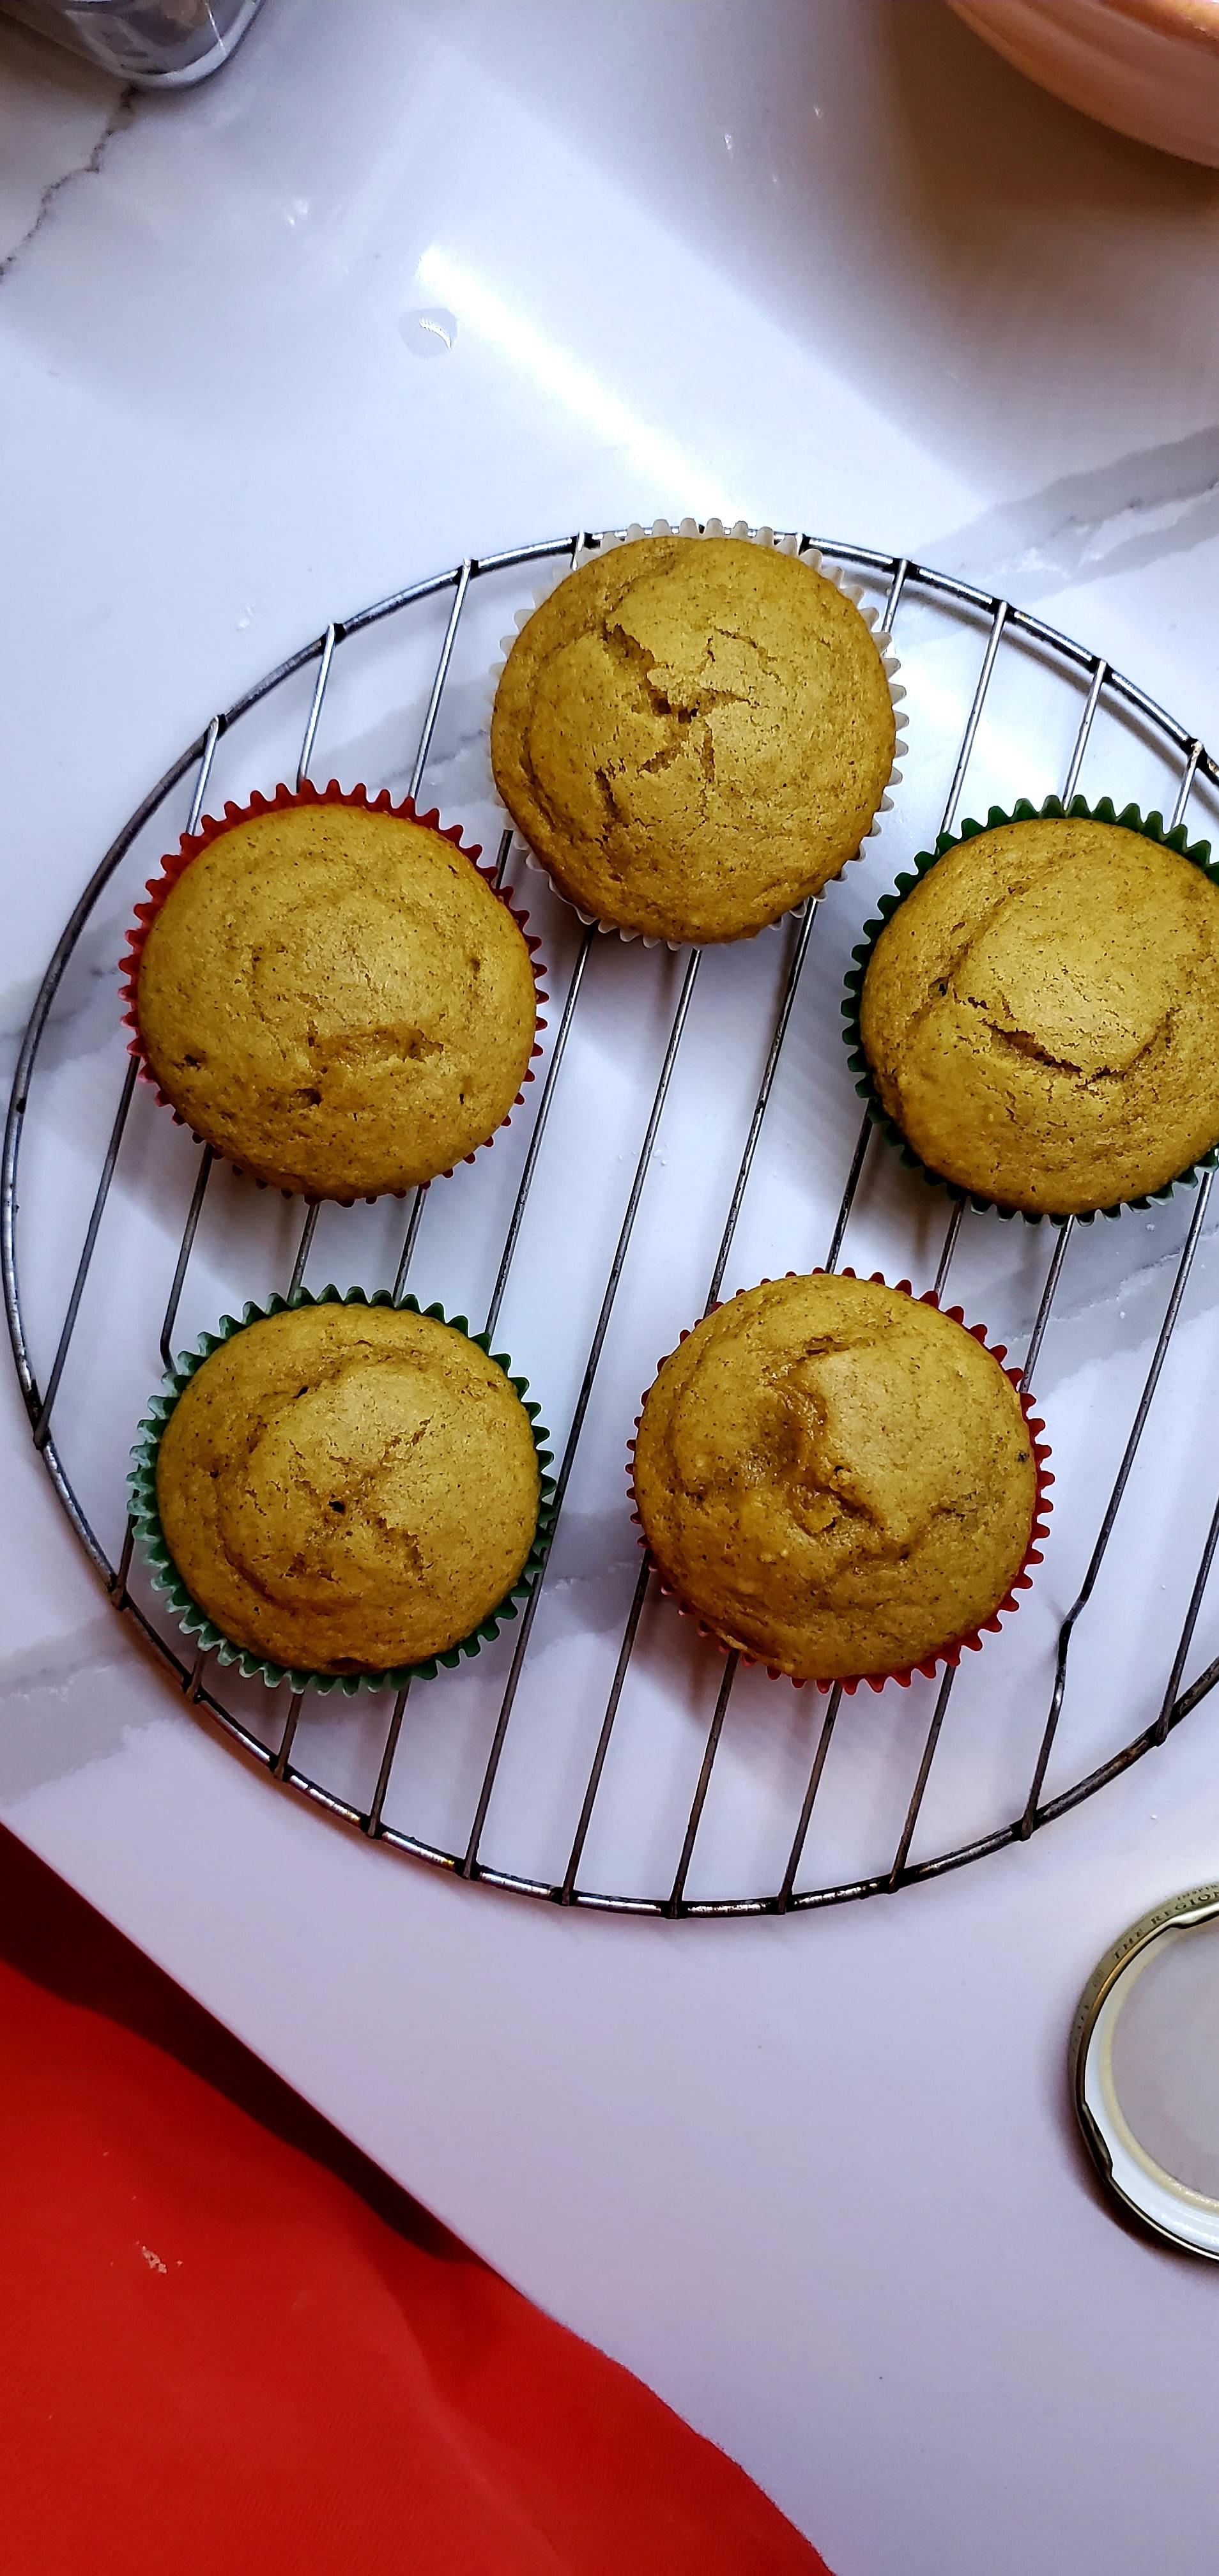 Pumpkin Spice Cupcakes angie Villarreal